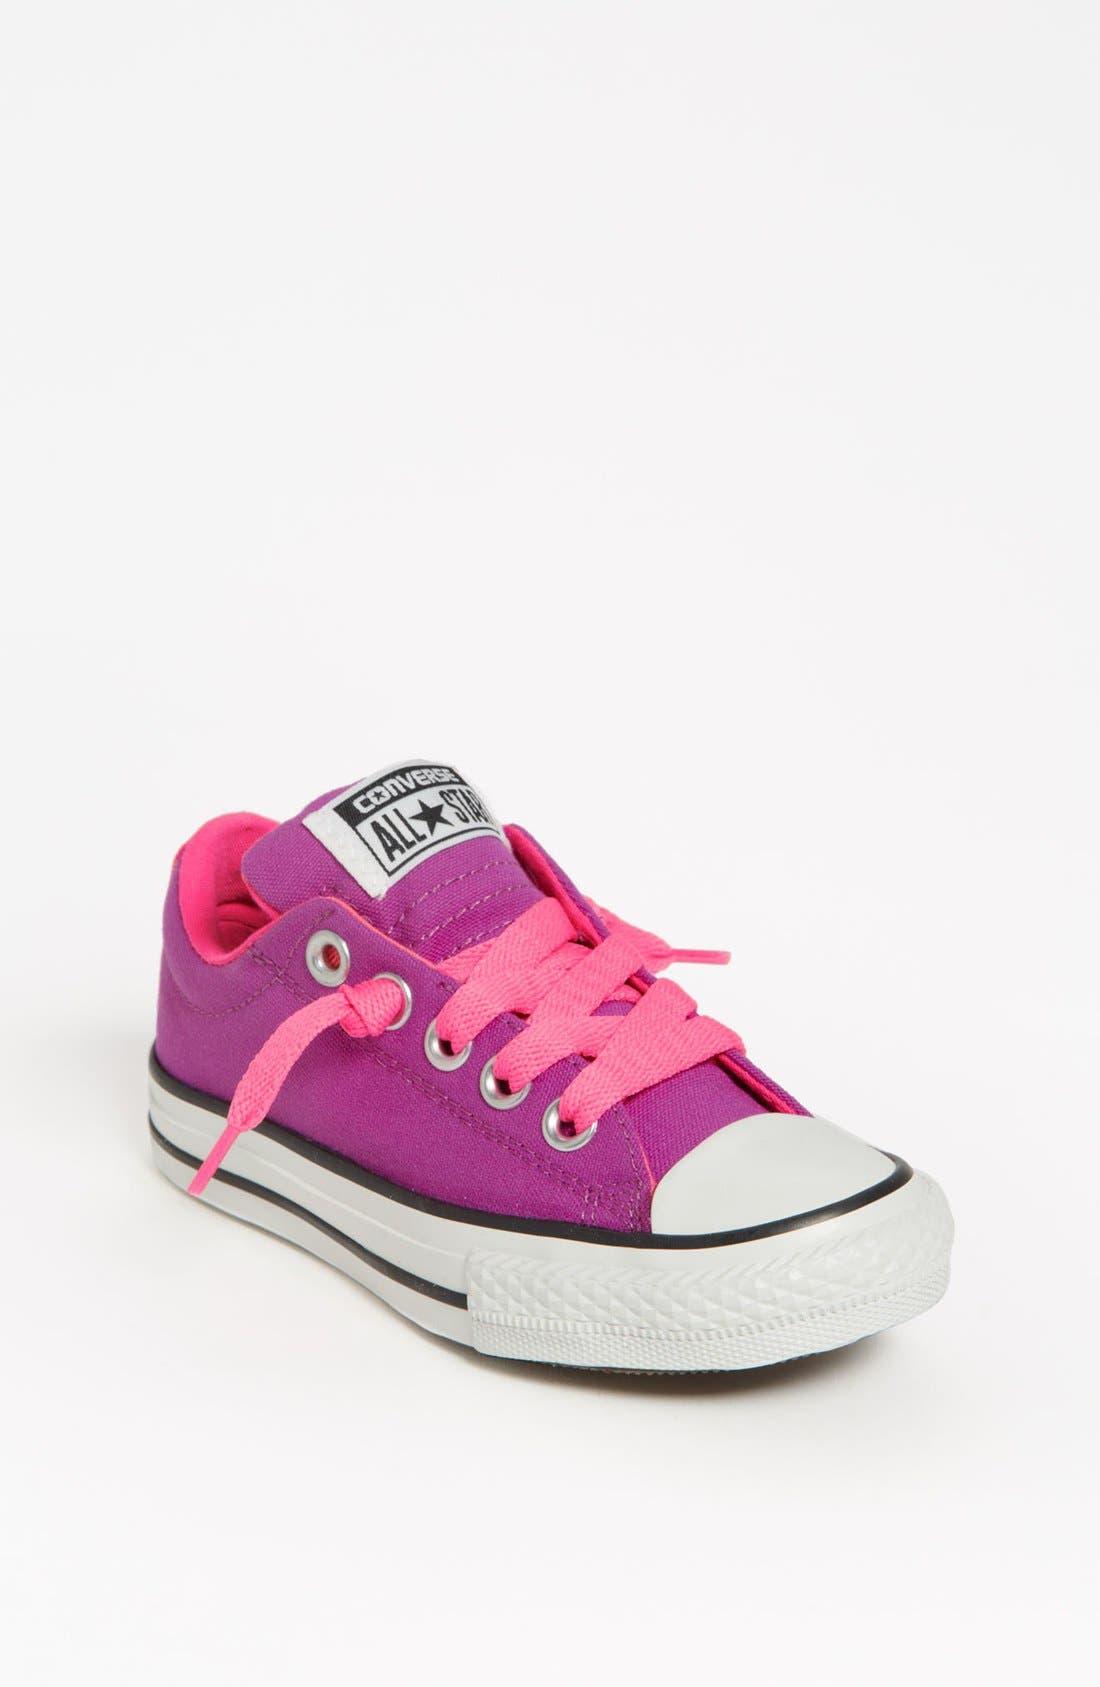 Main Image - Converse Chuck Taylor® All Star® 'Neon Street' Sneaker (Toddler, Little Kid & Big Kid)